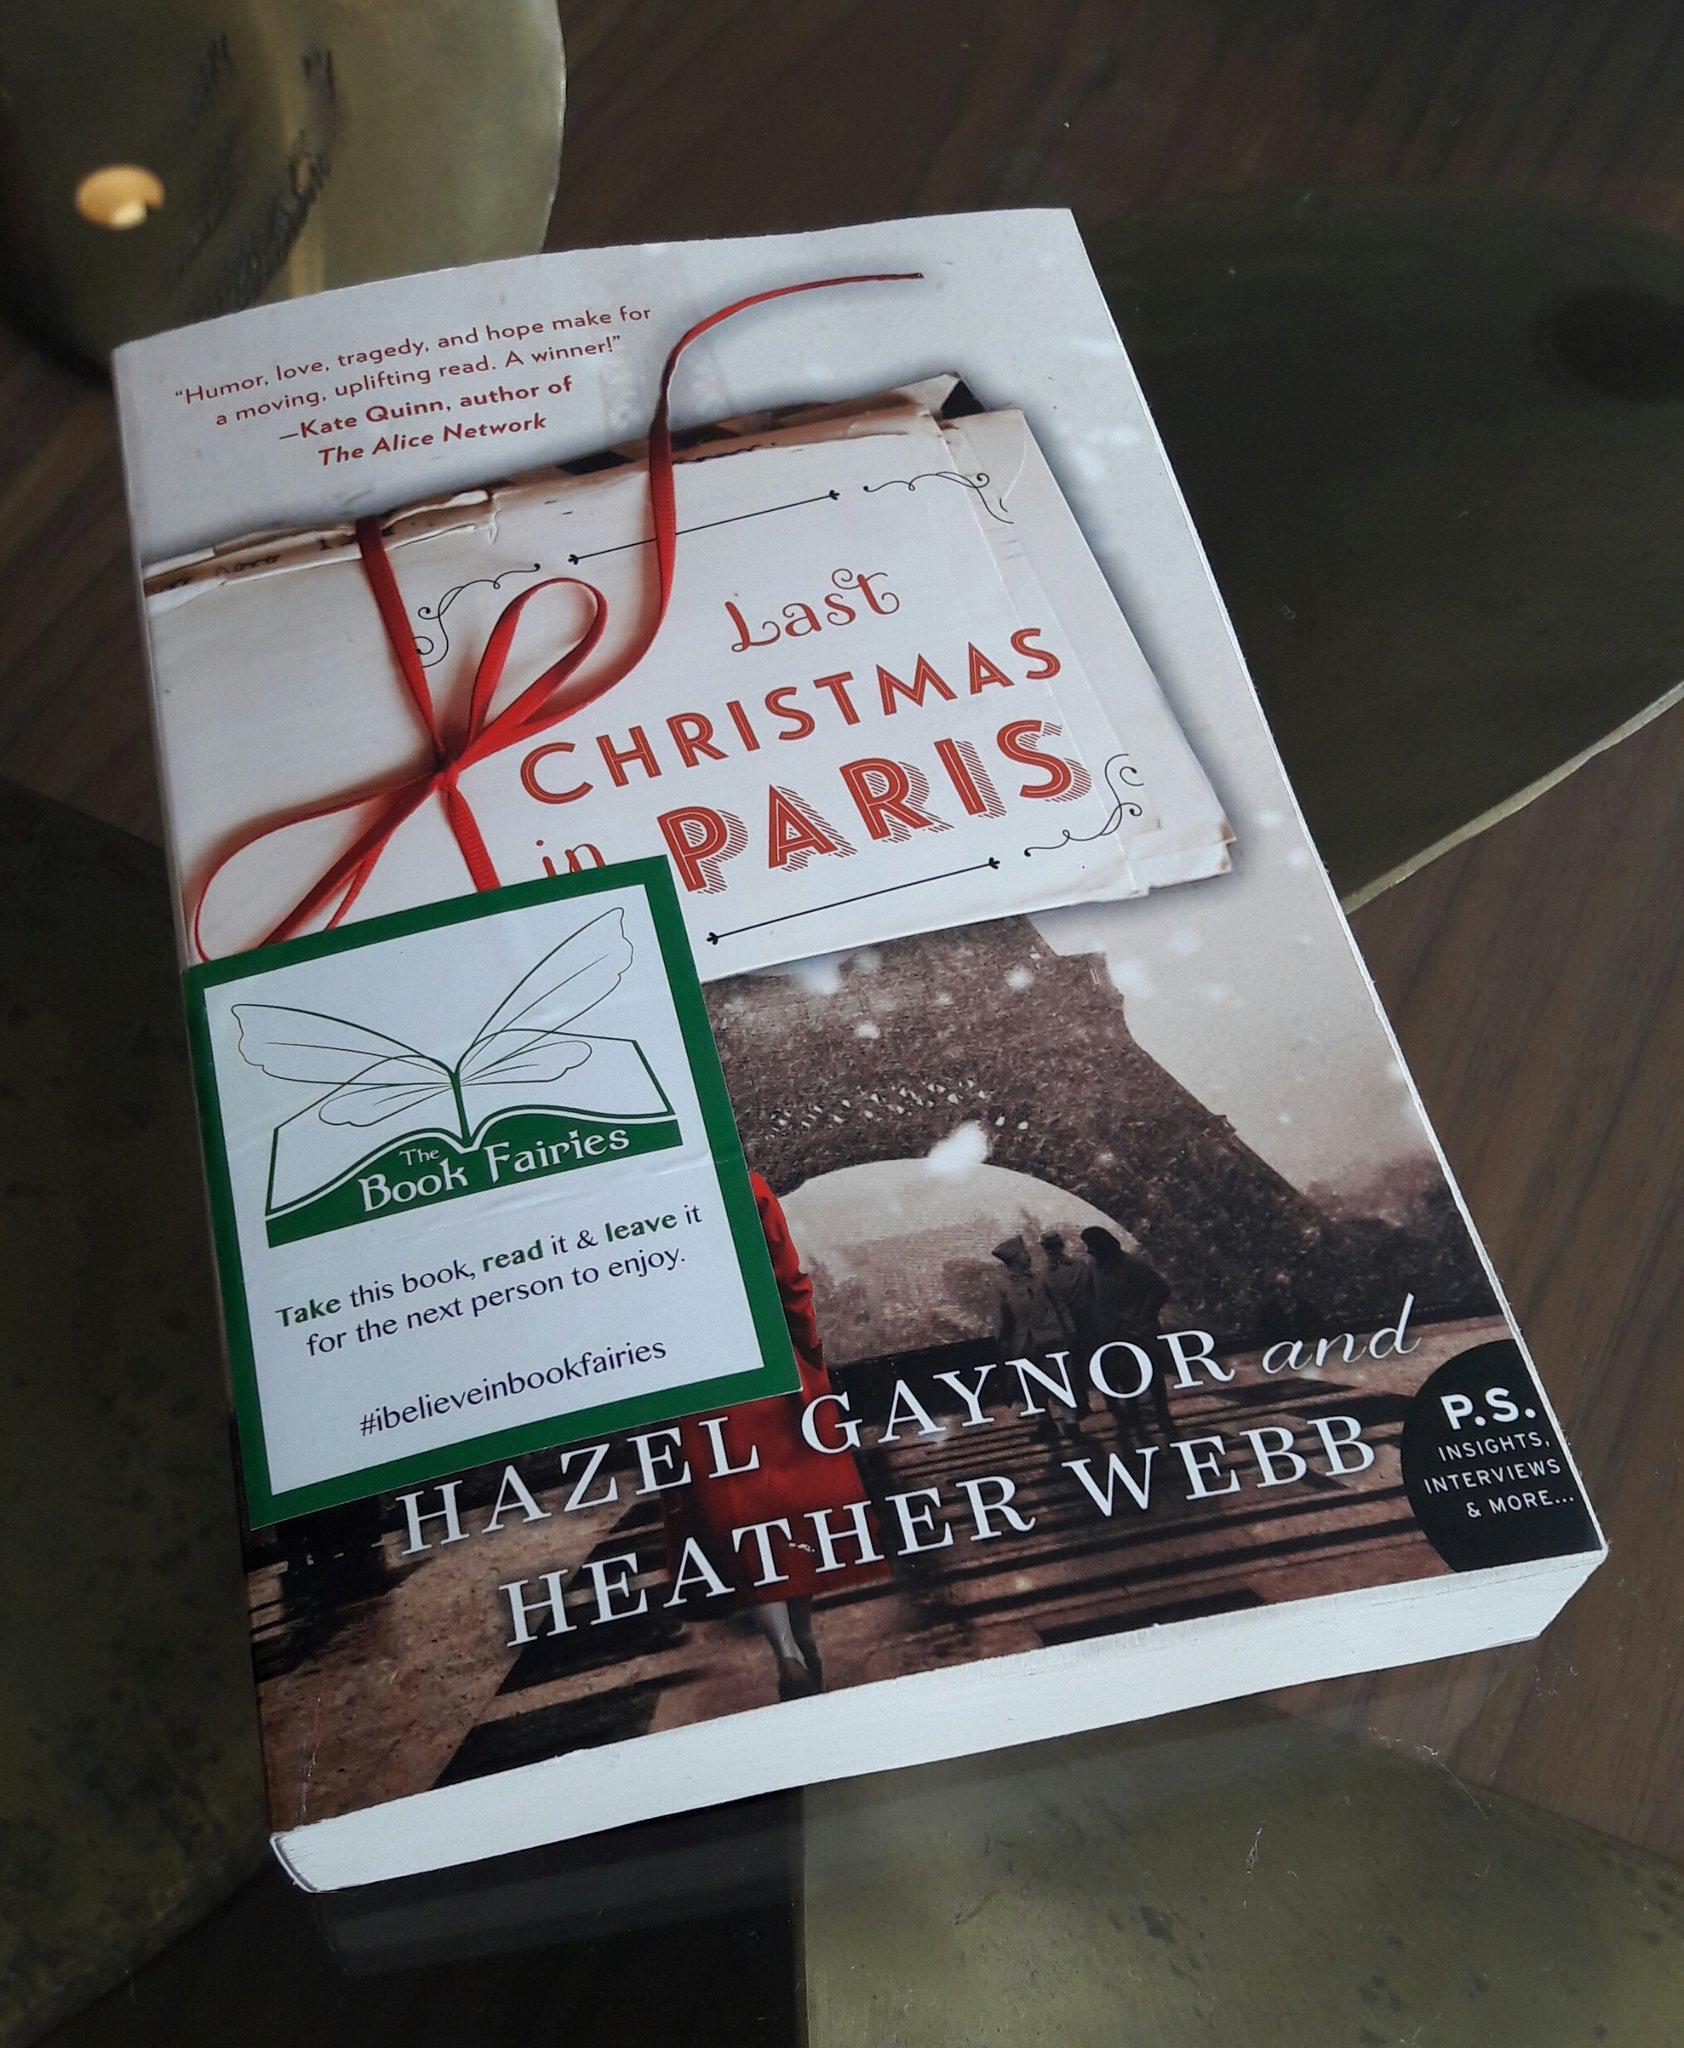 Last Christmas In Paris Book.Hazel Gaynor On Twitter Last Christmas In Paris Waiting